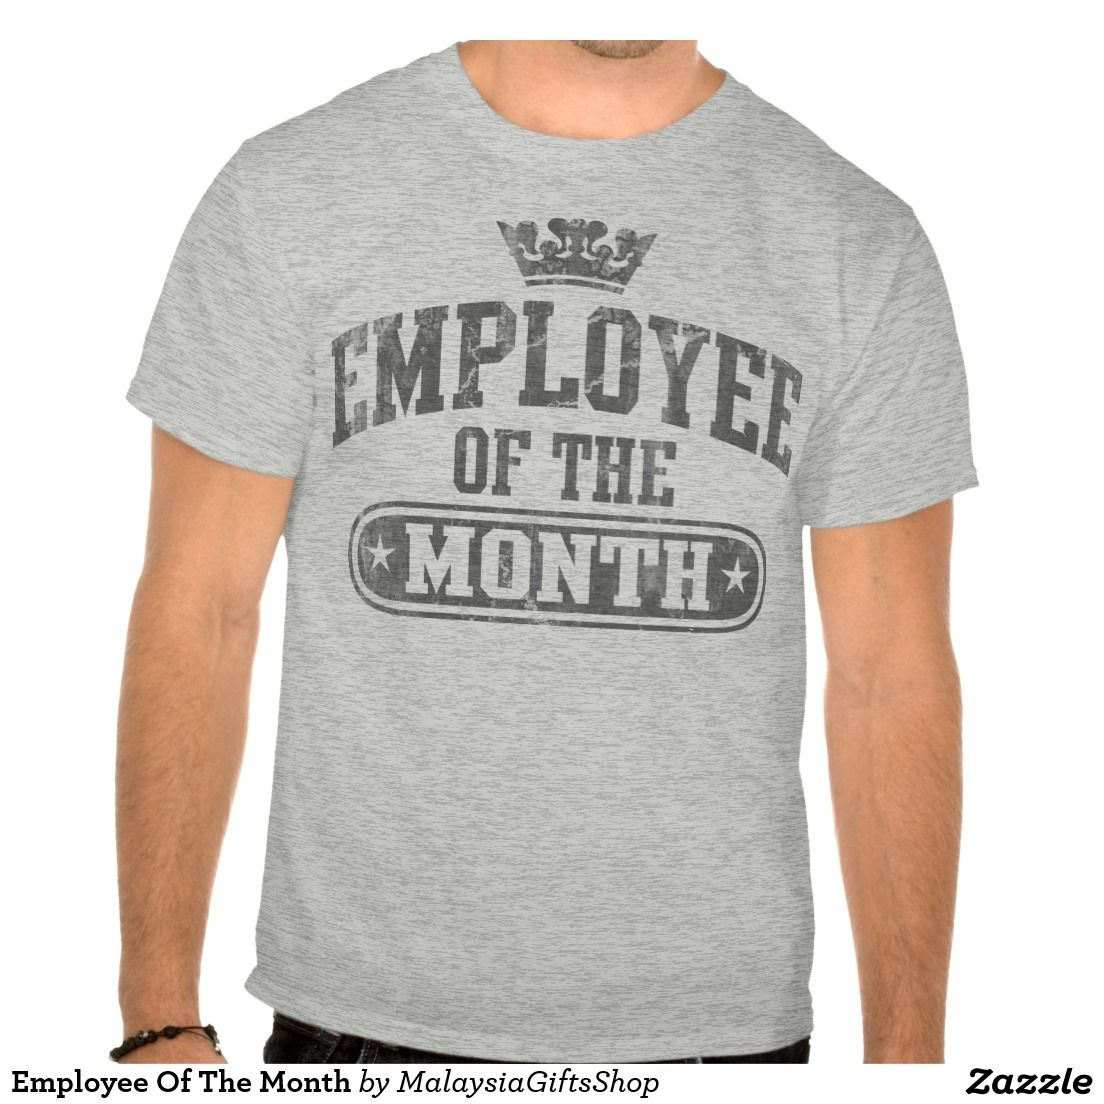 615ec3823 Employee Of The Month T-Shirt | Zazzle.com | Employee Of The Month ...